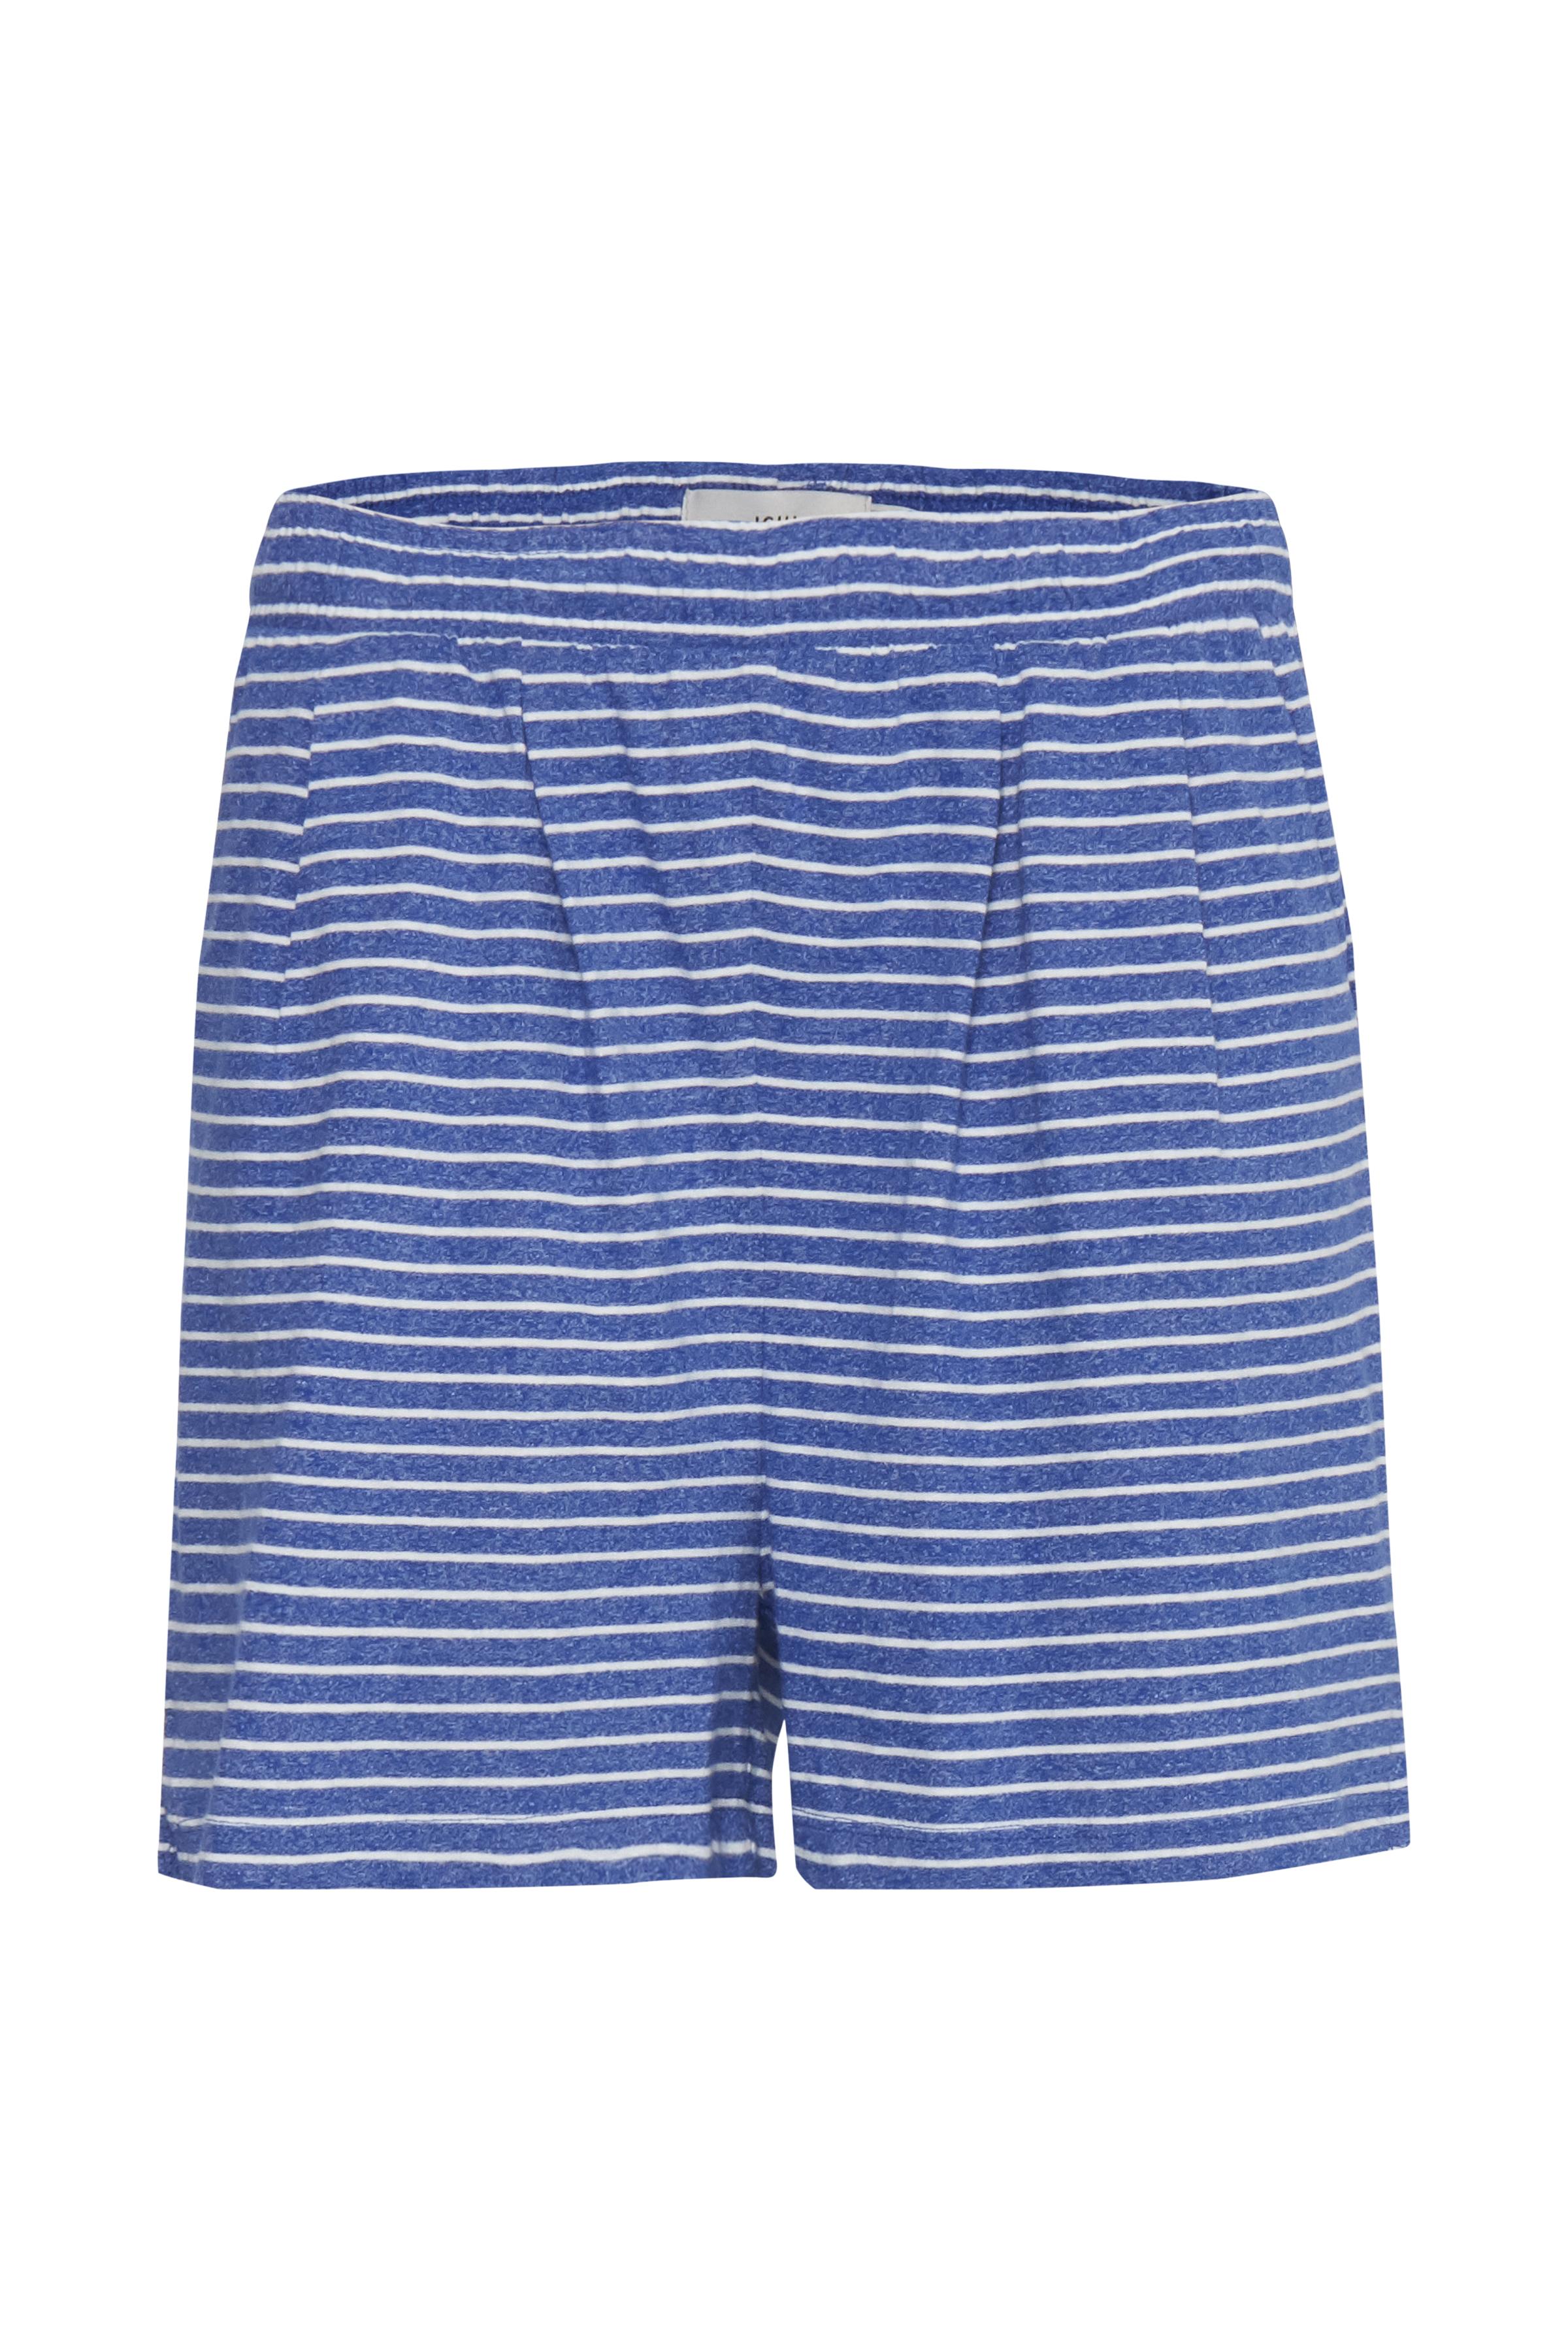 Small Stripe Mazarine Blue